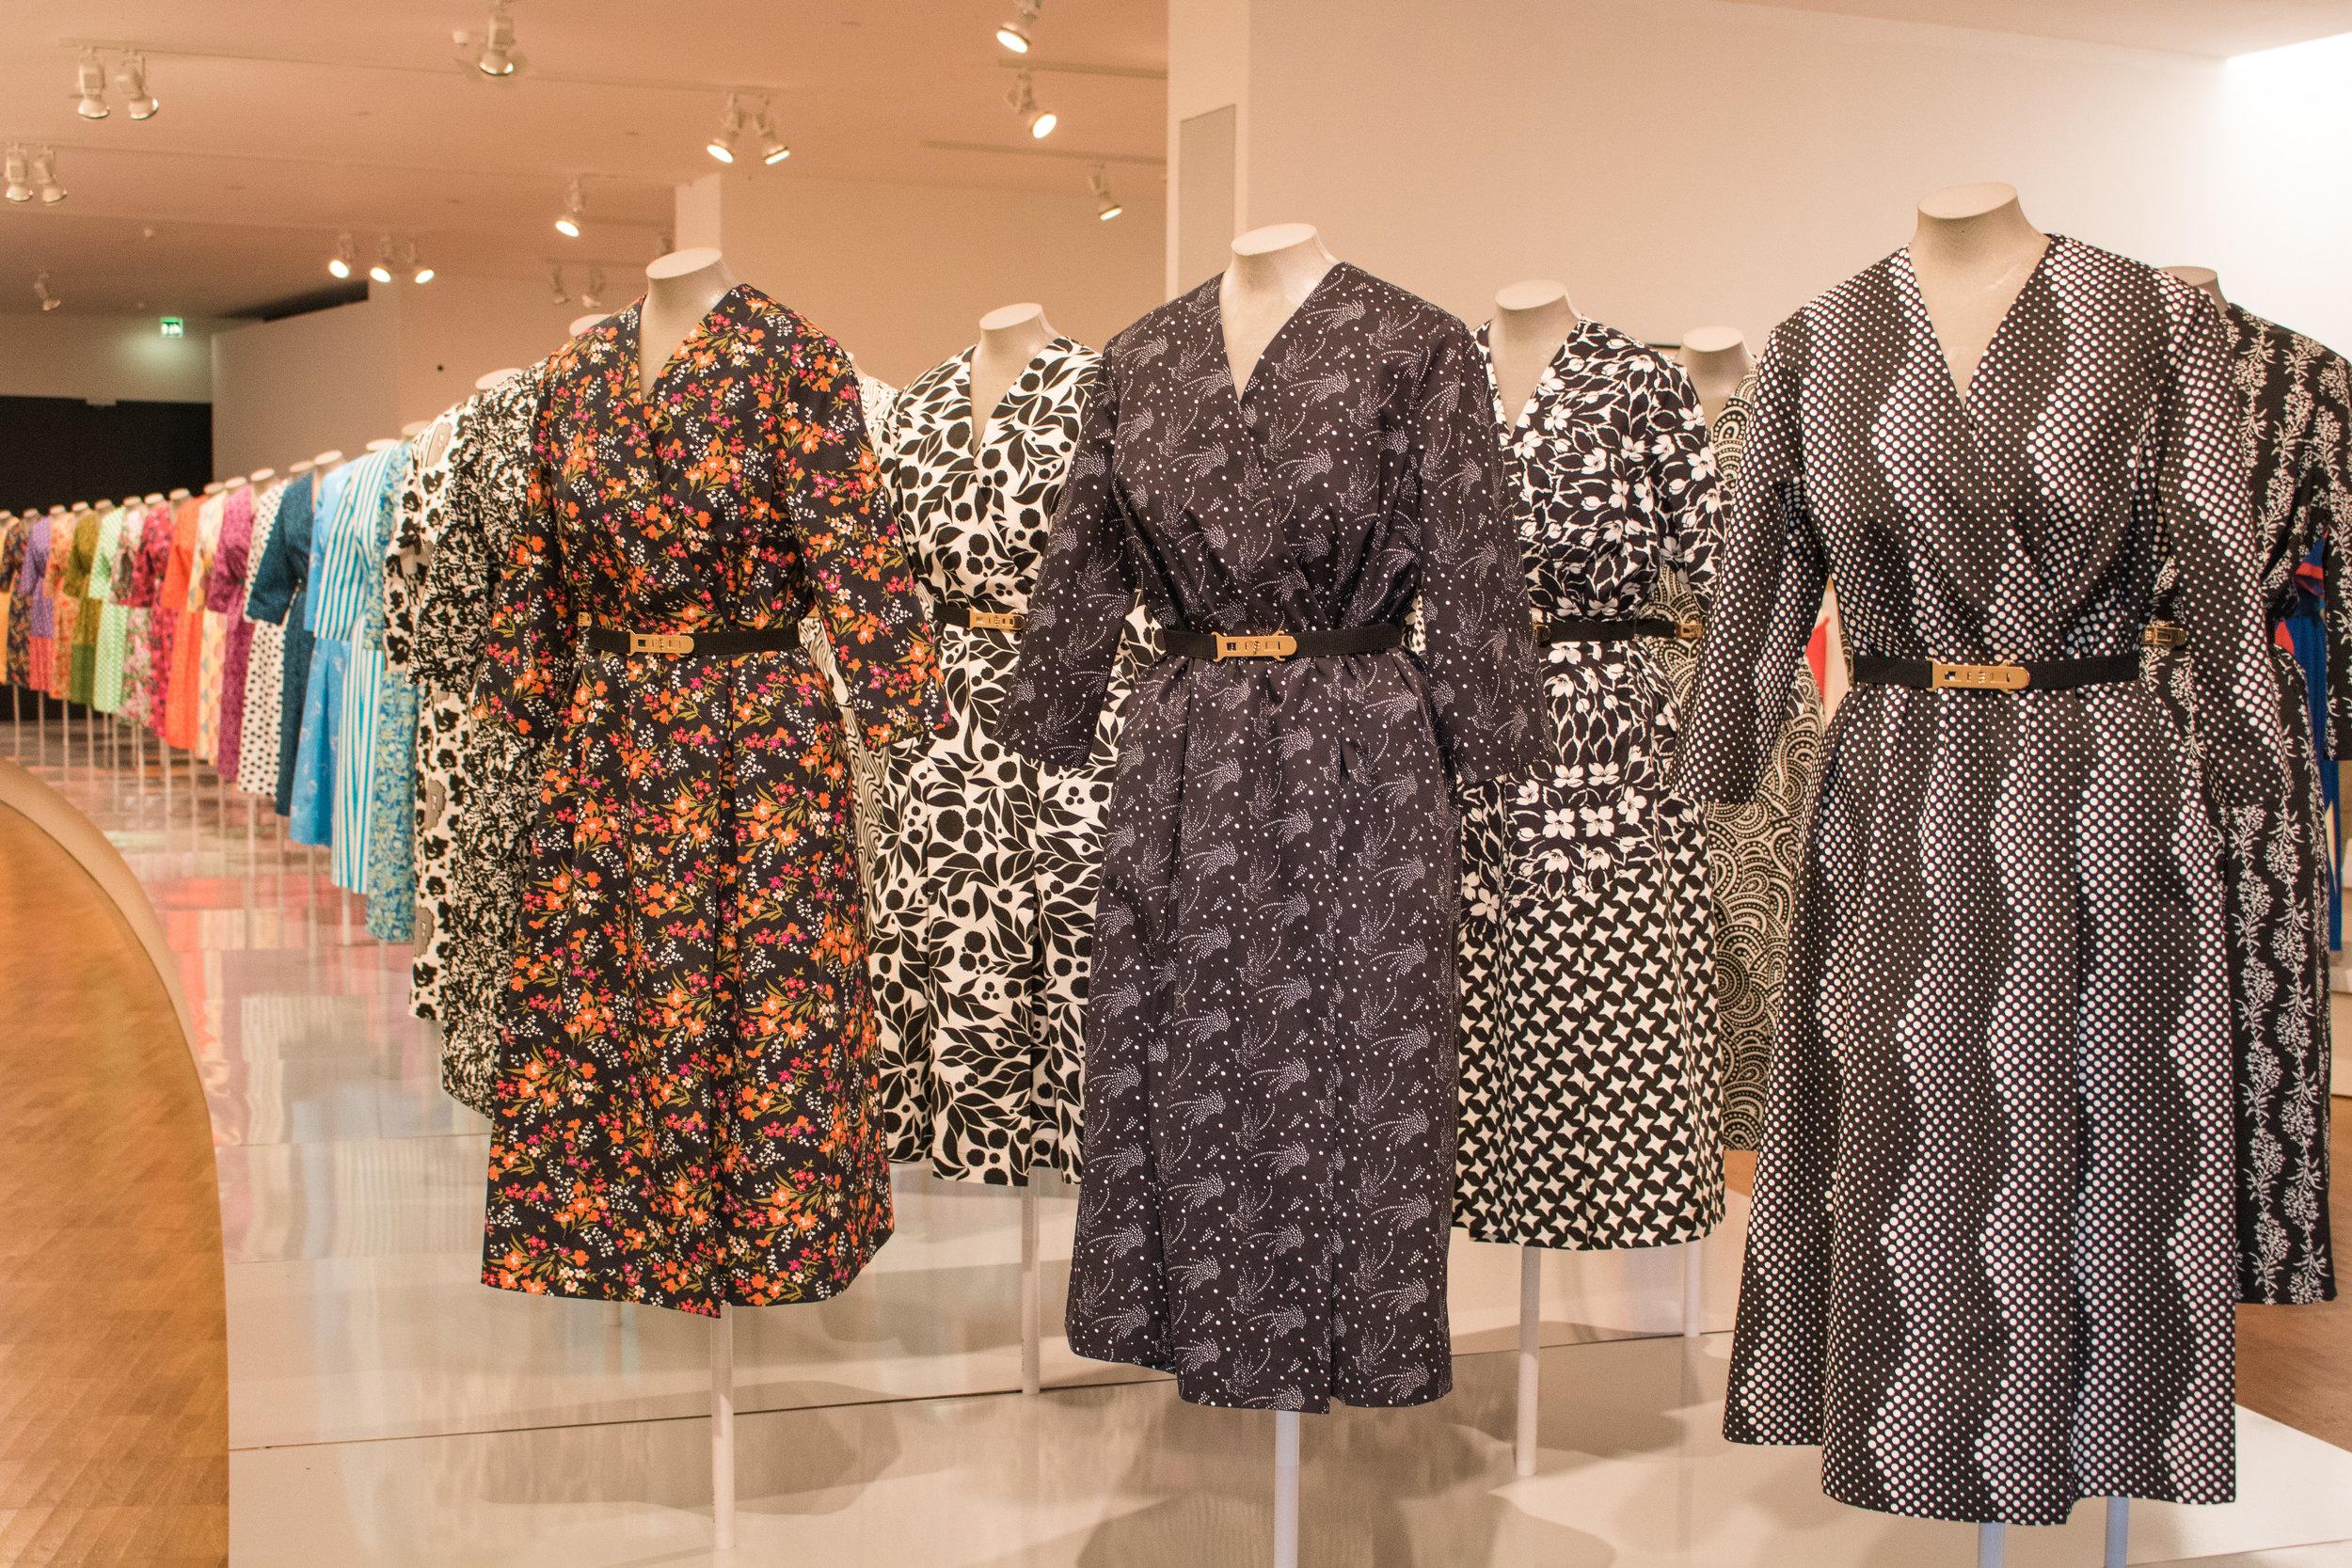 fashion exhibit at kumu art museum tallinn estonia.jpg